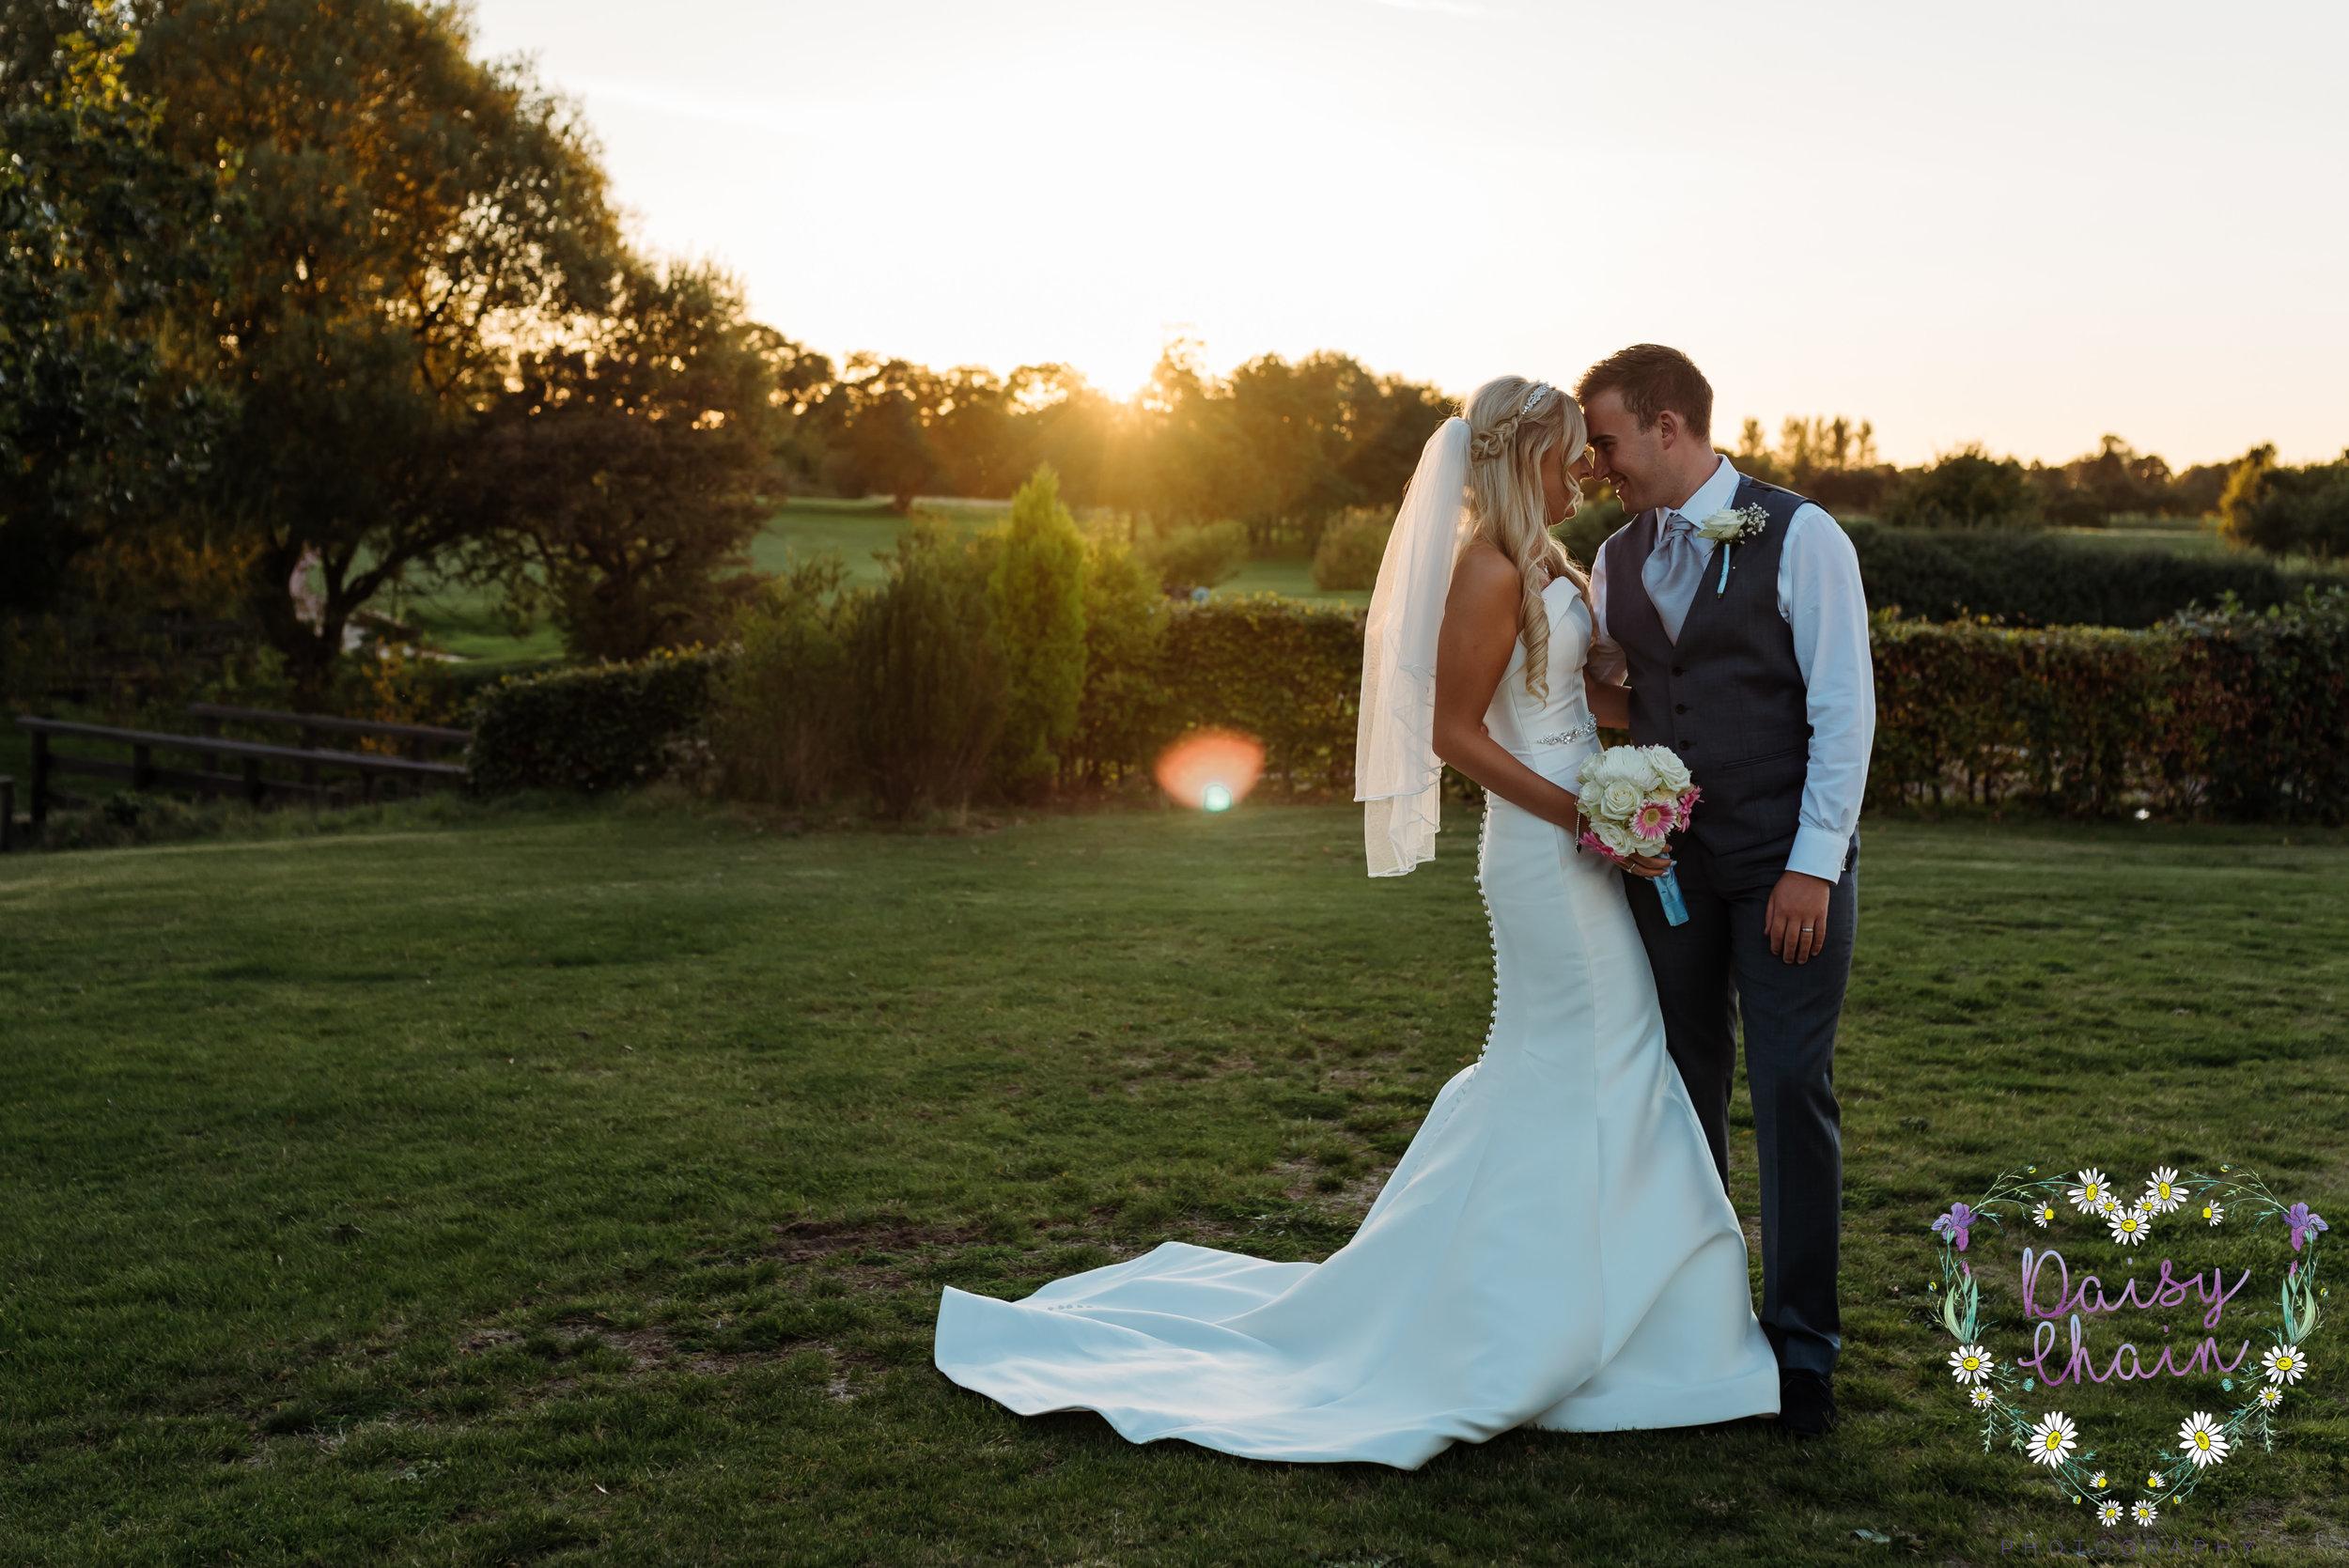 Sunset wedding photography - Merseyside